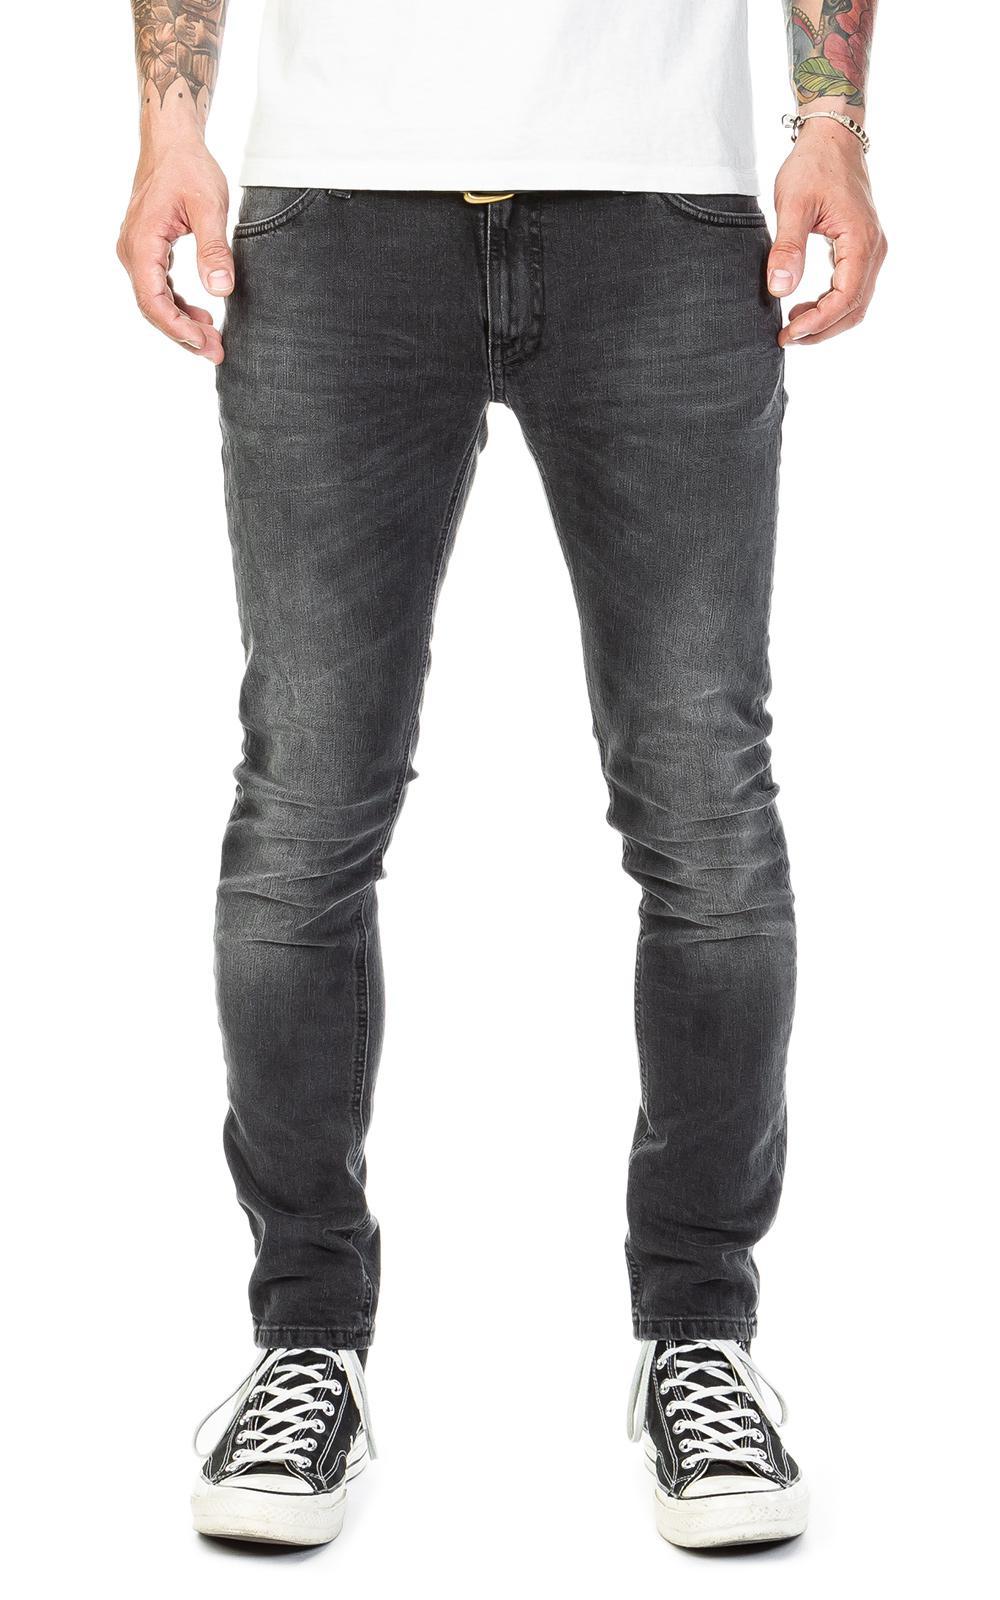 9b21e9680faef Nudie Jeans Skinny Lin Black Movement in Black for Men - Lyst